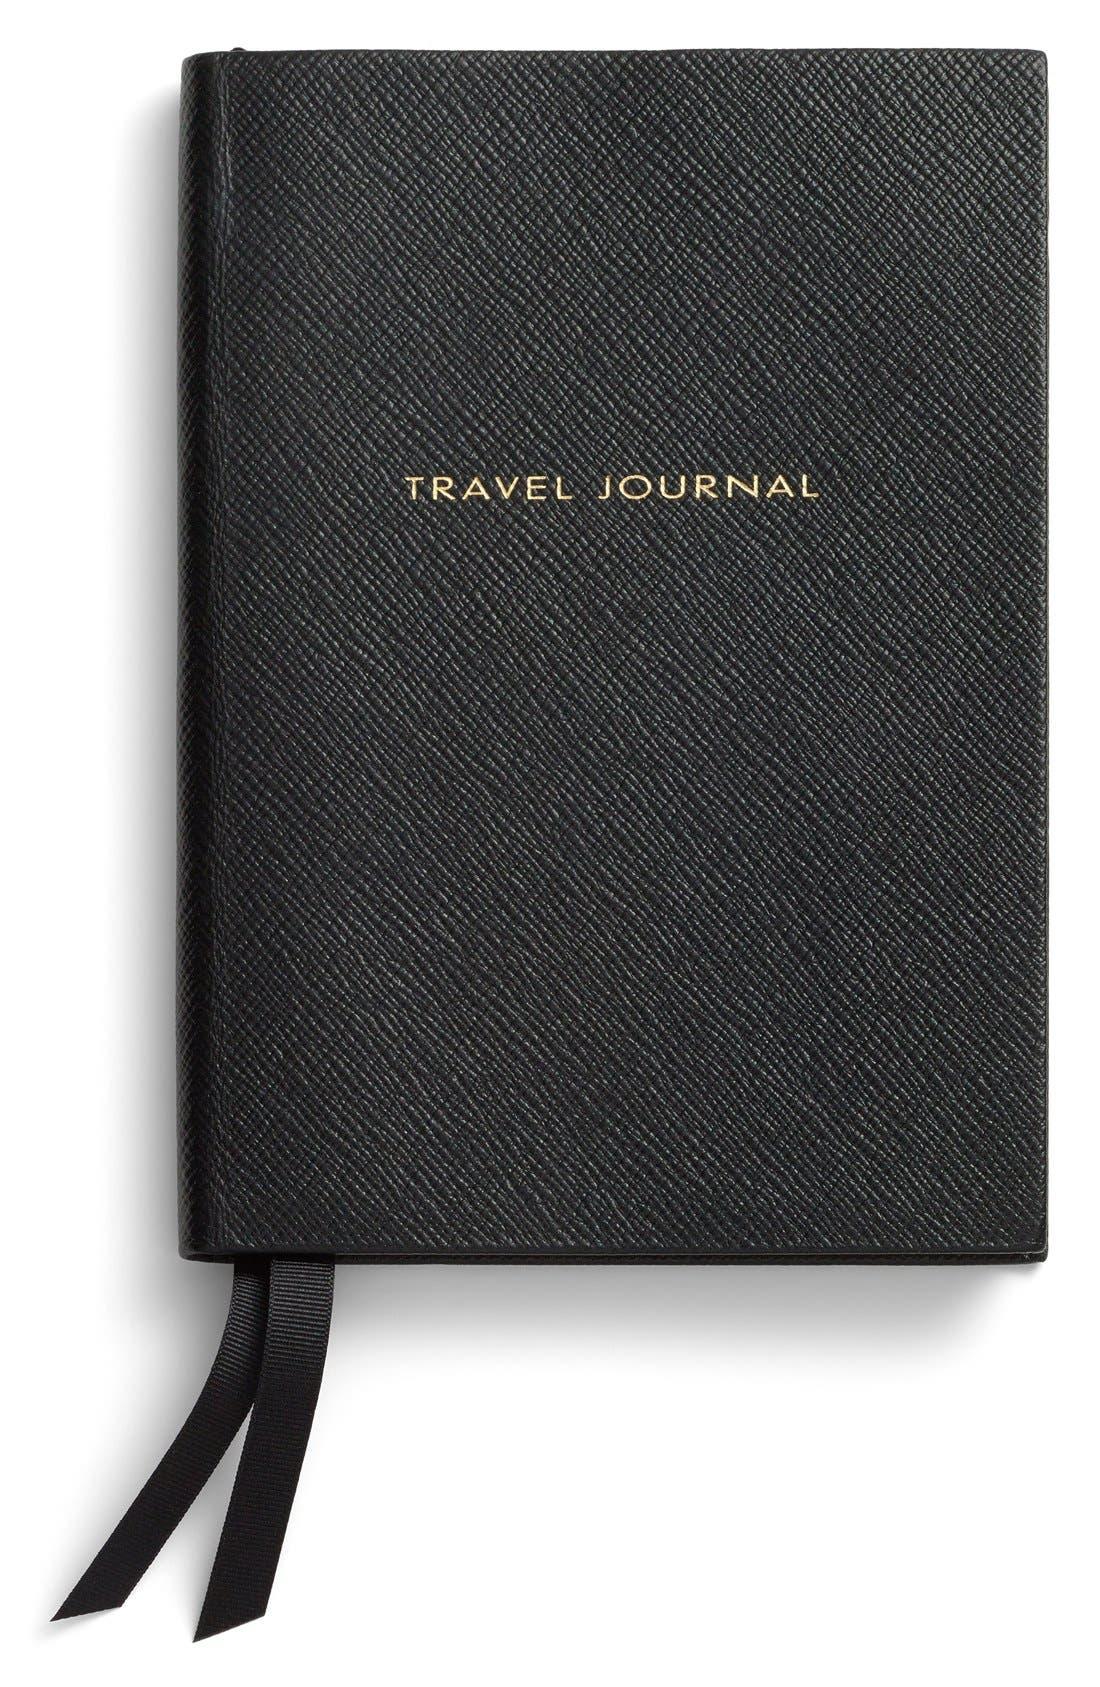 Main Image - Smythson Travel Journal